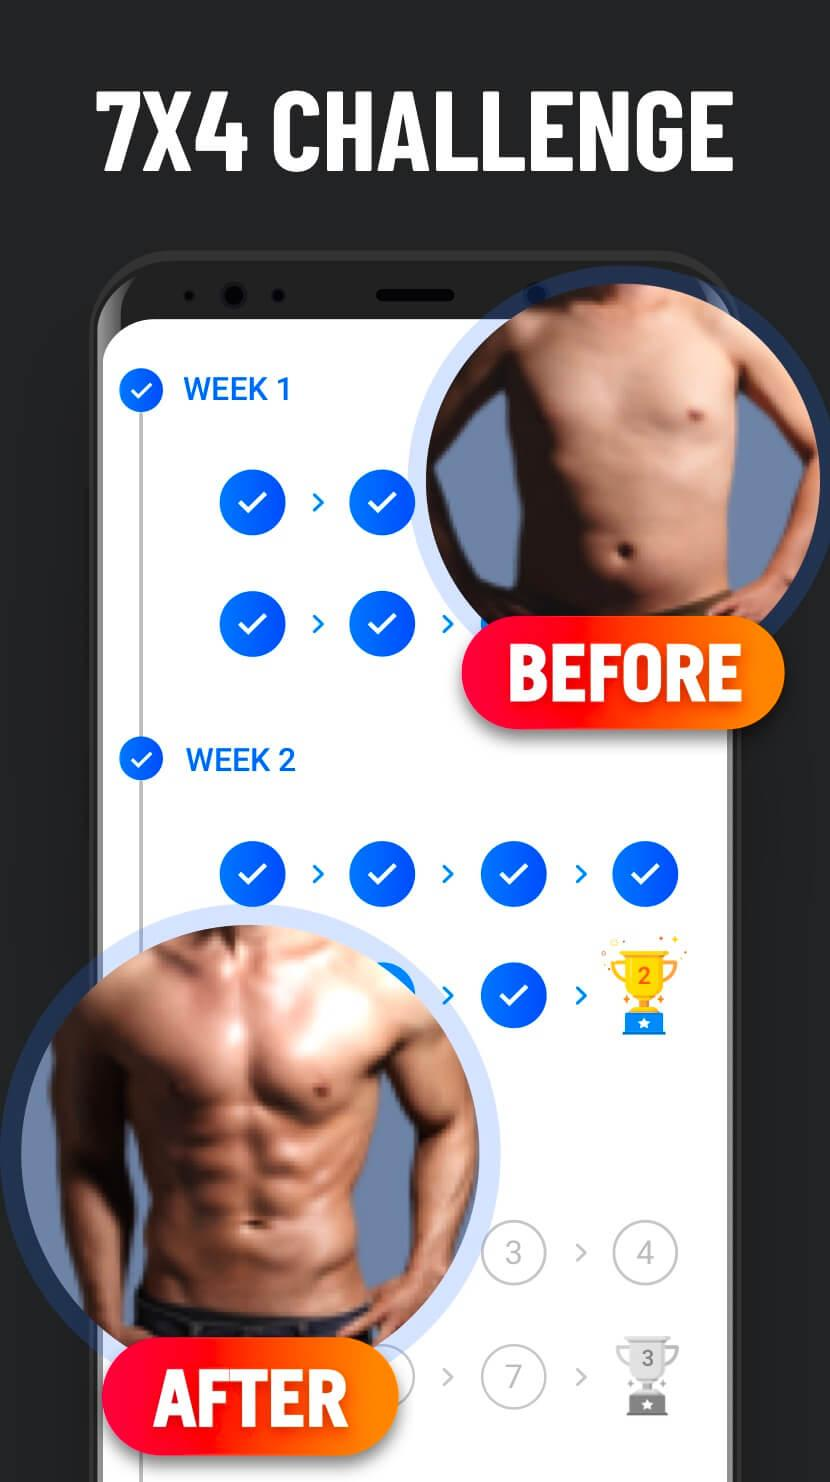 Home Workout No Equipment 1.1.2 Screenshot 5